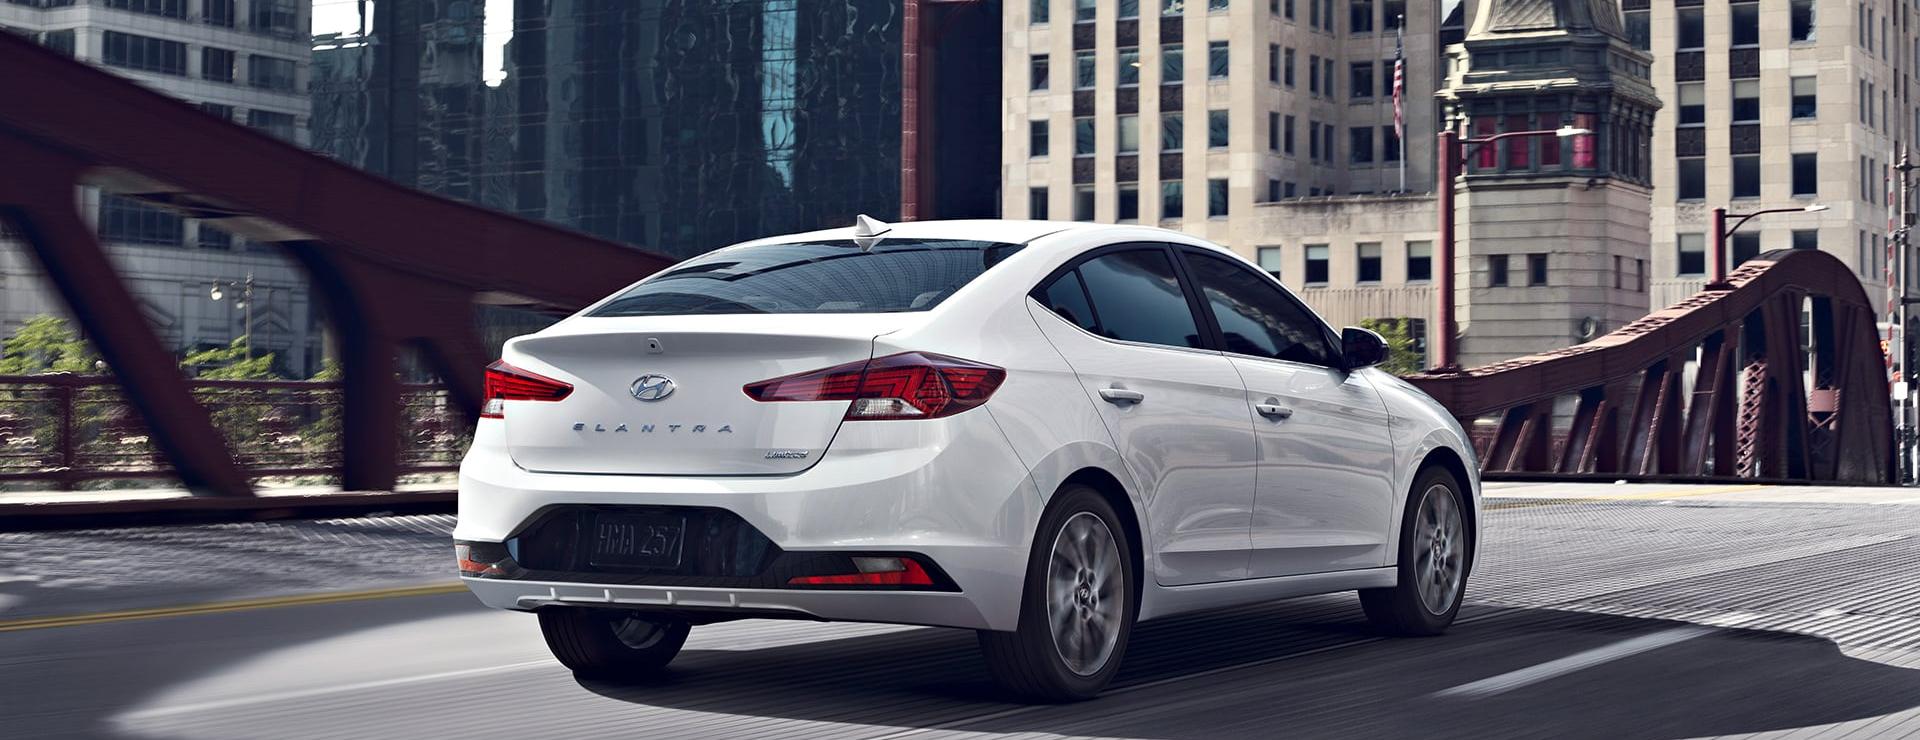 Hyundai Elantra 2020 a la venta cerca de Alexandria, VA